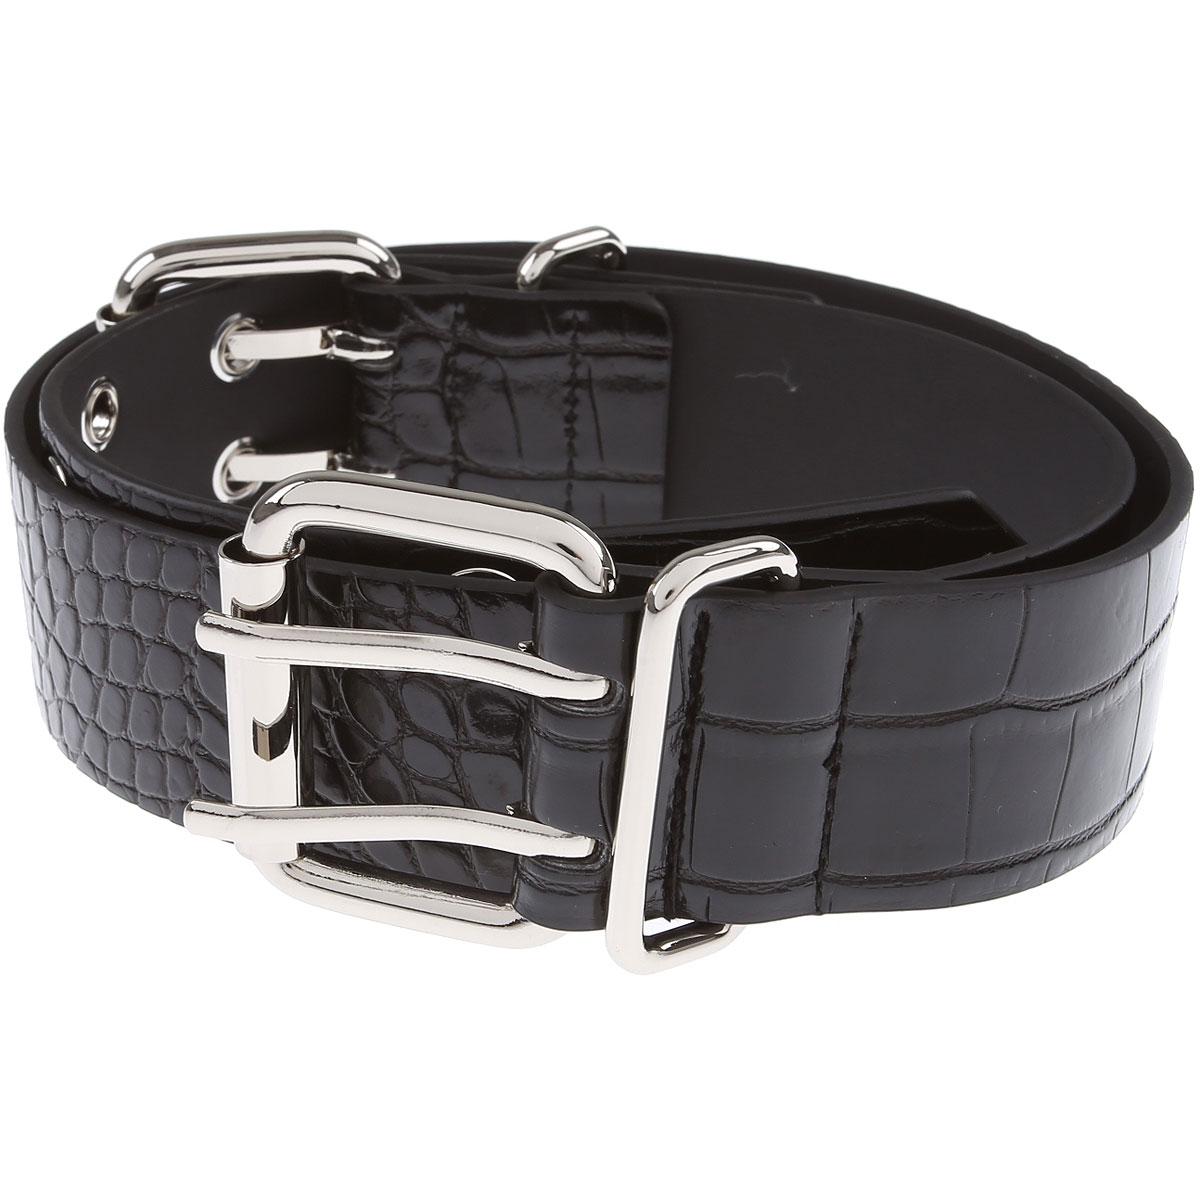 Pinko Belt for Women On Sale, Black, Fabric, 2019, Medium Large